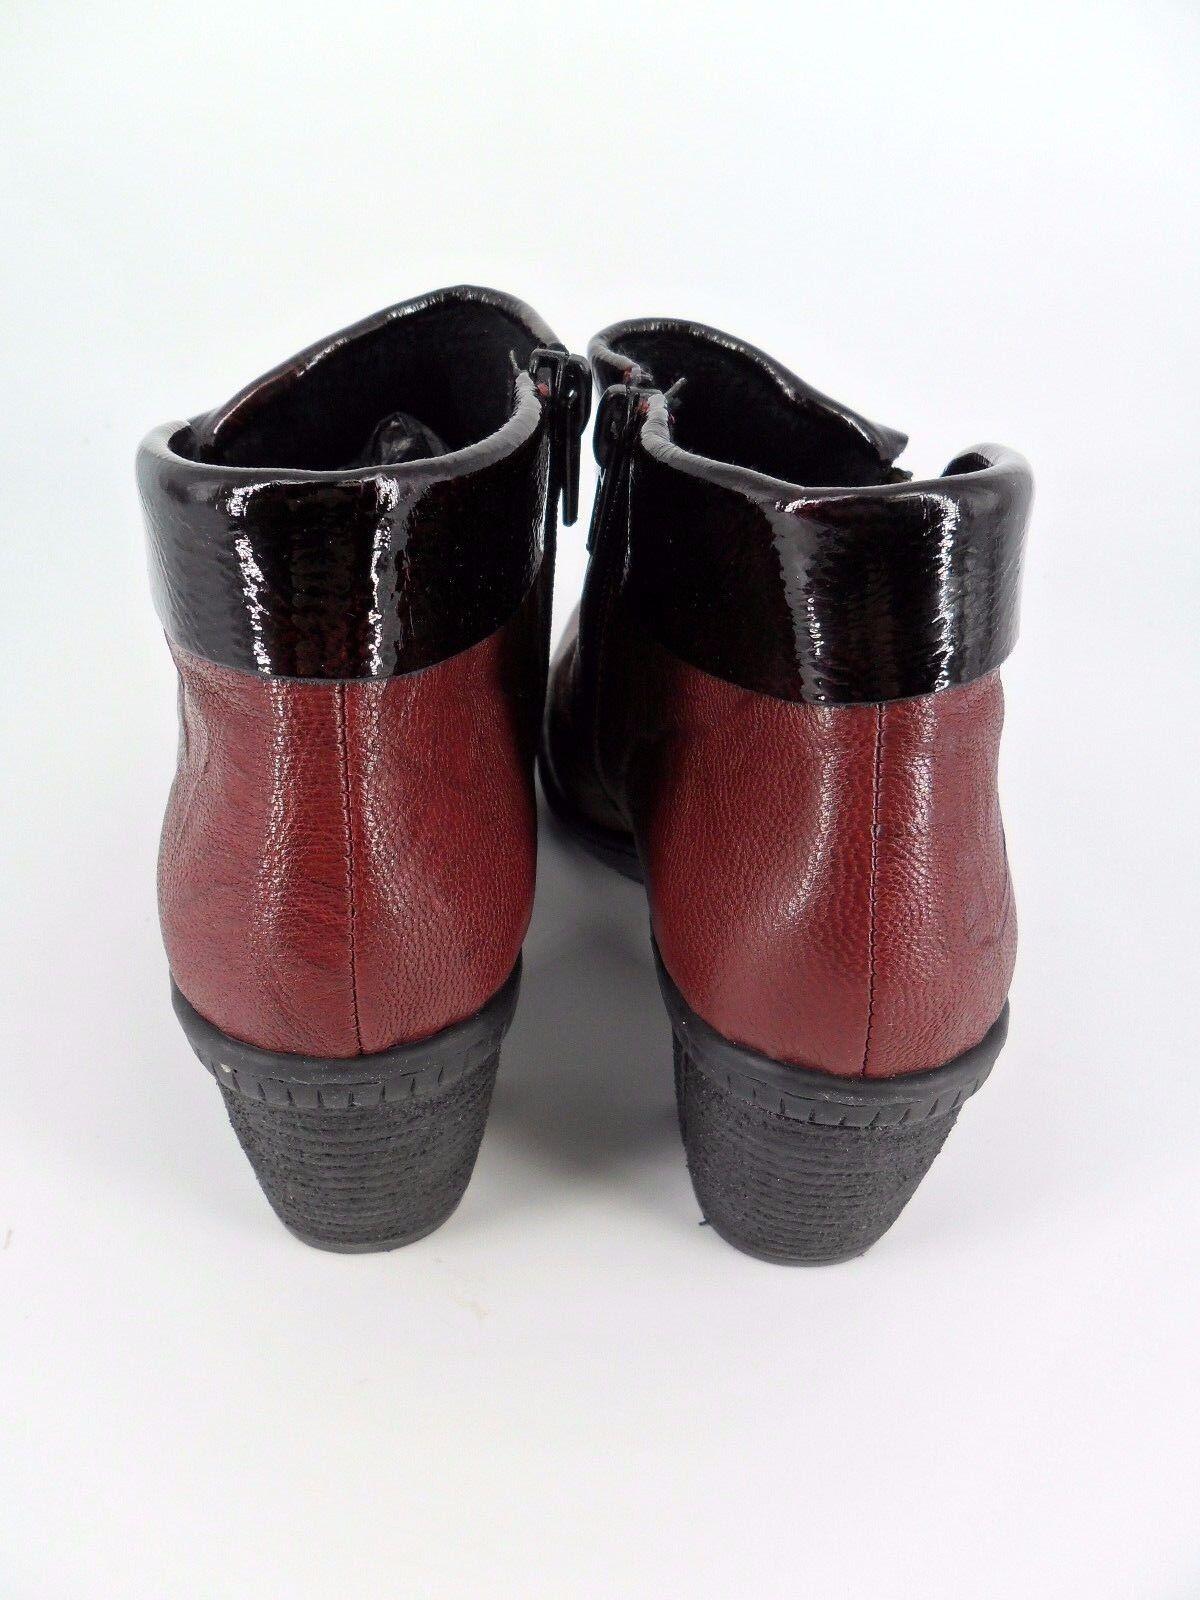 Rieker Ladies Ladies Ladies Leather Ankle Boots Burgundy UK 4 EU 37 LN11 75 SALEw e4e942